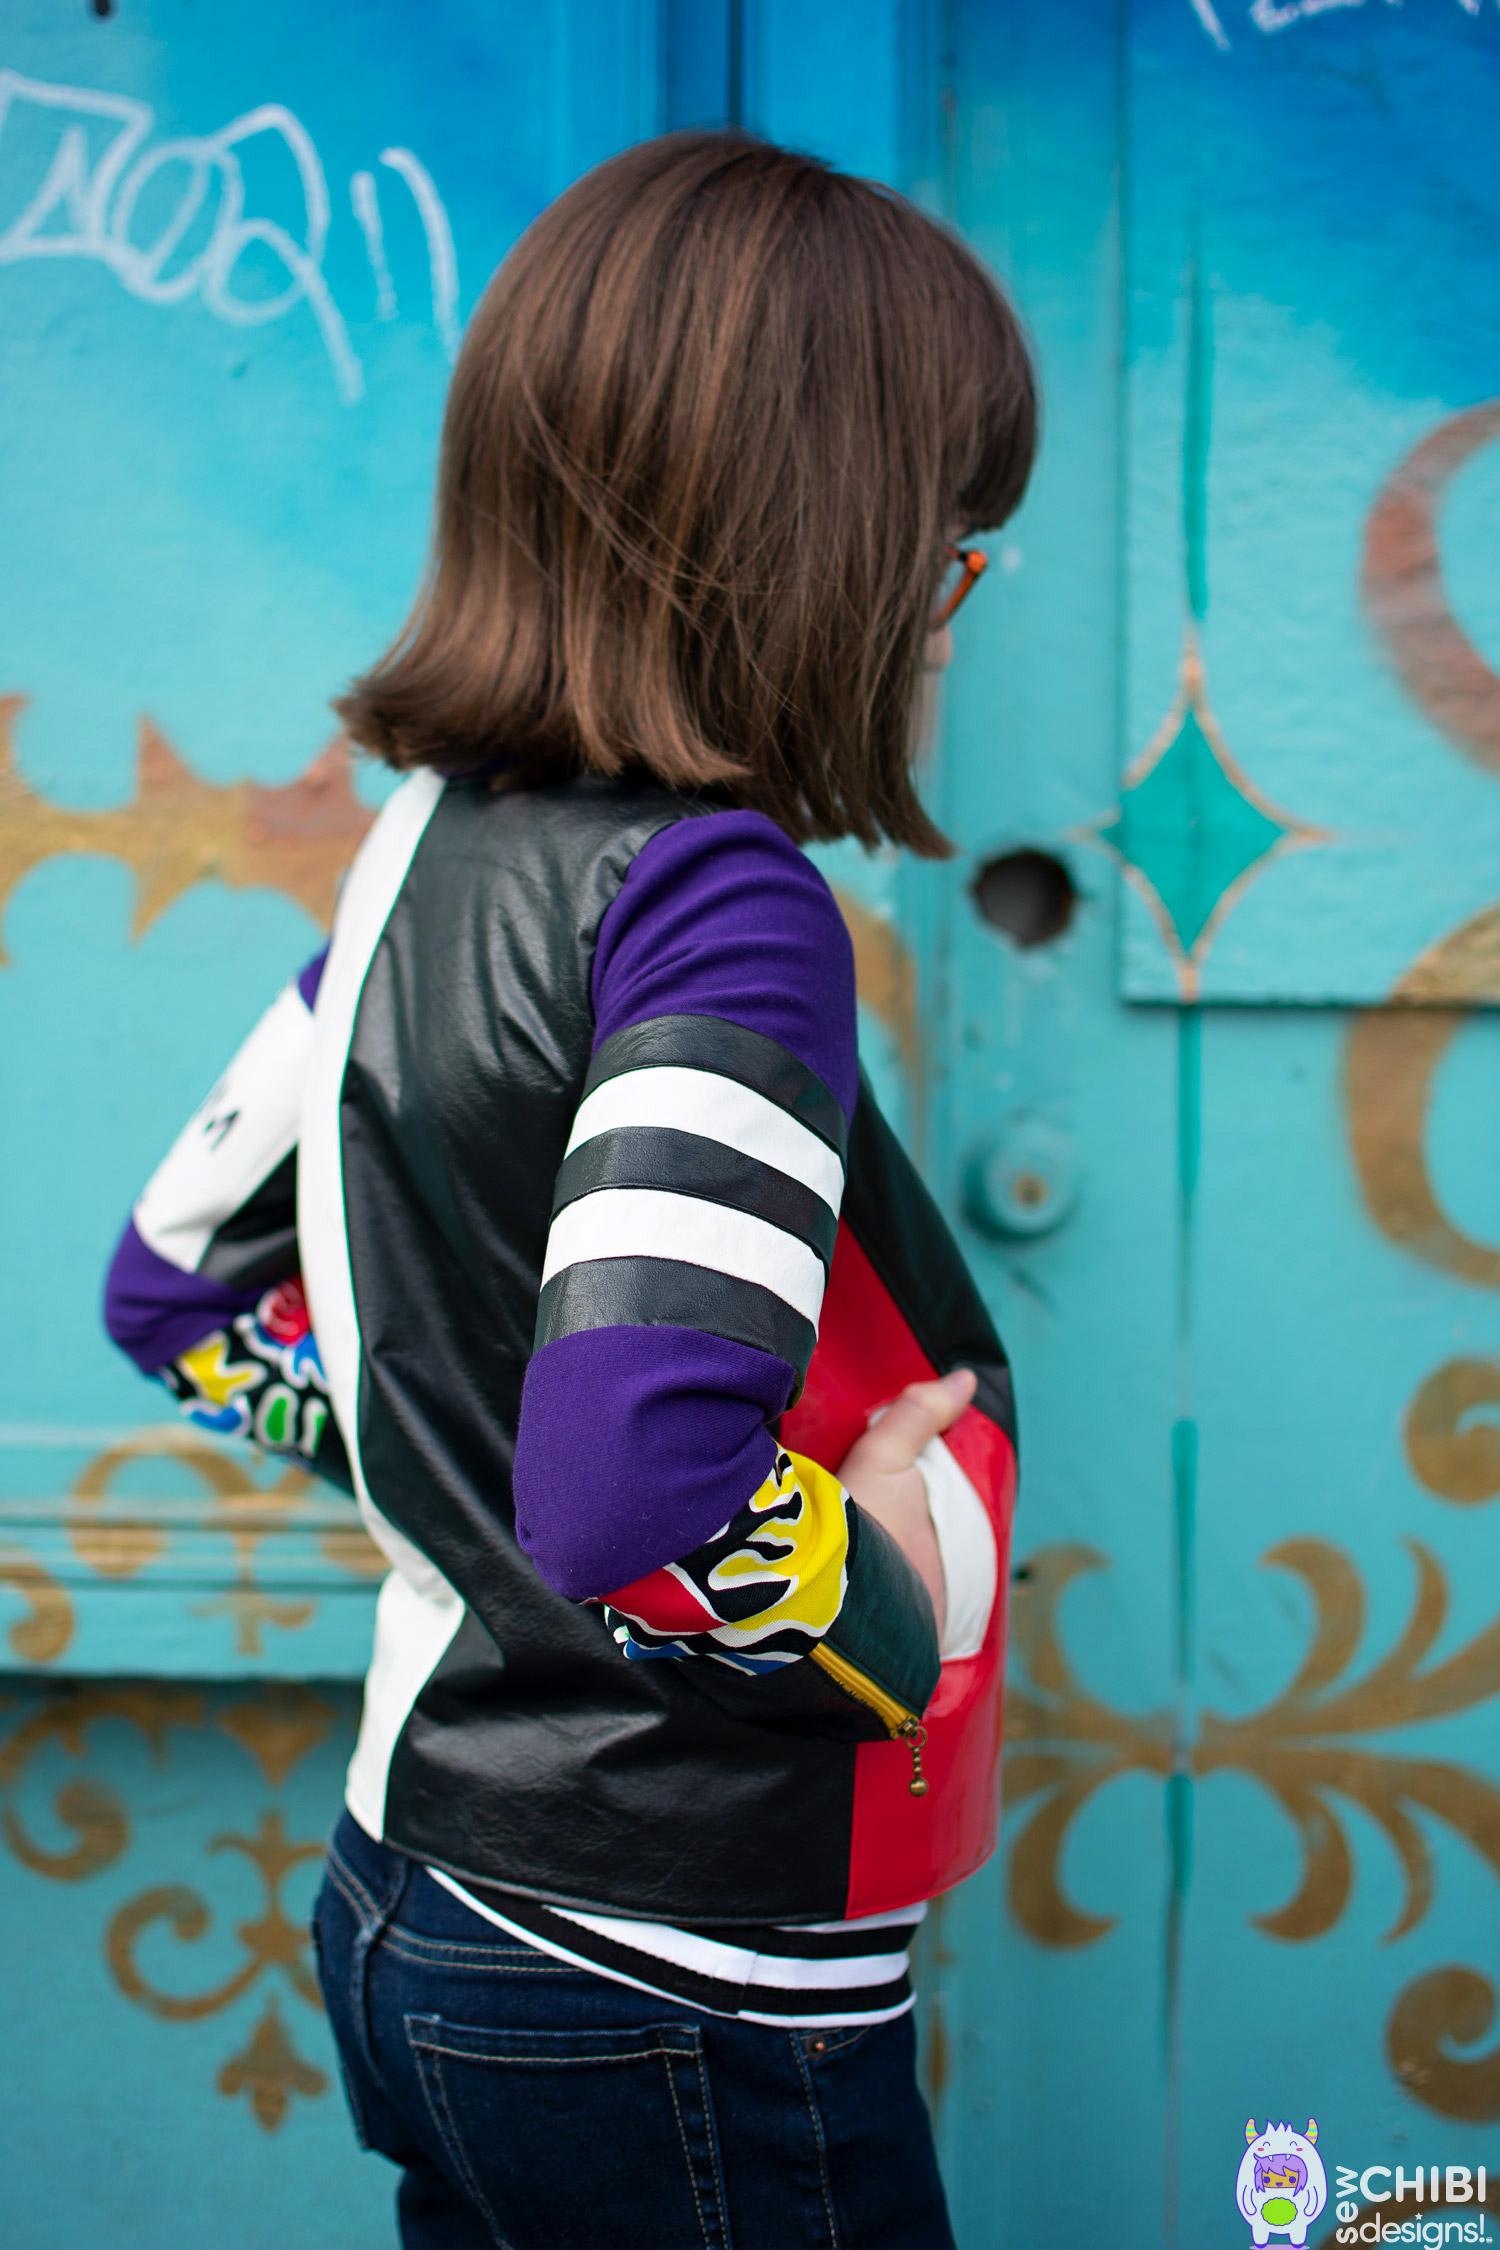 moto-jacket-by-sew-chibi-designs-6.jpg